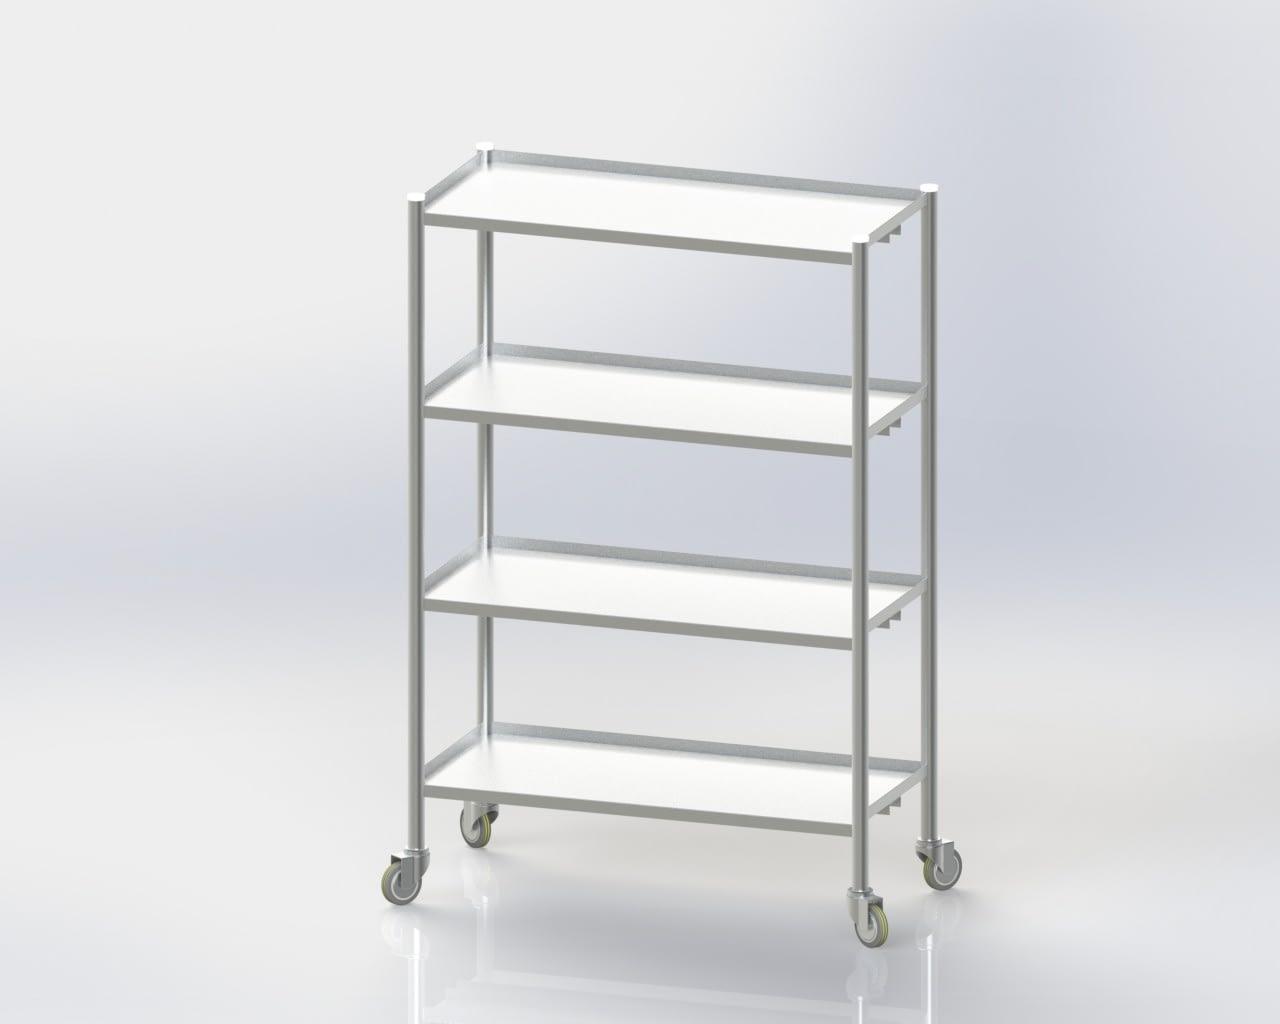 4 Storage Rack / Standard / Mobile